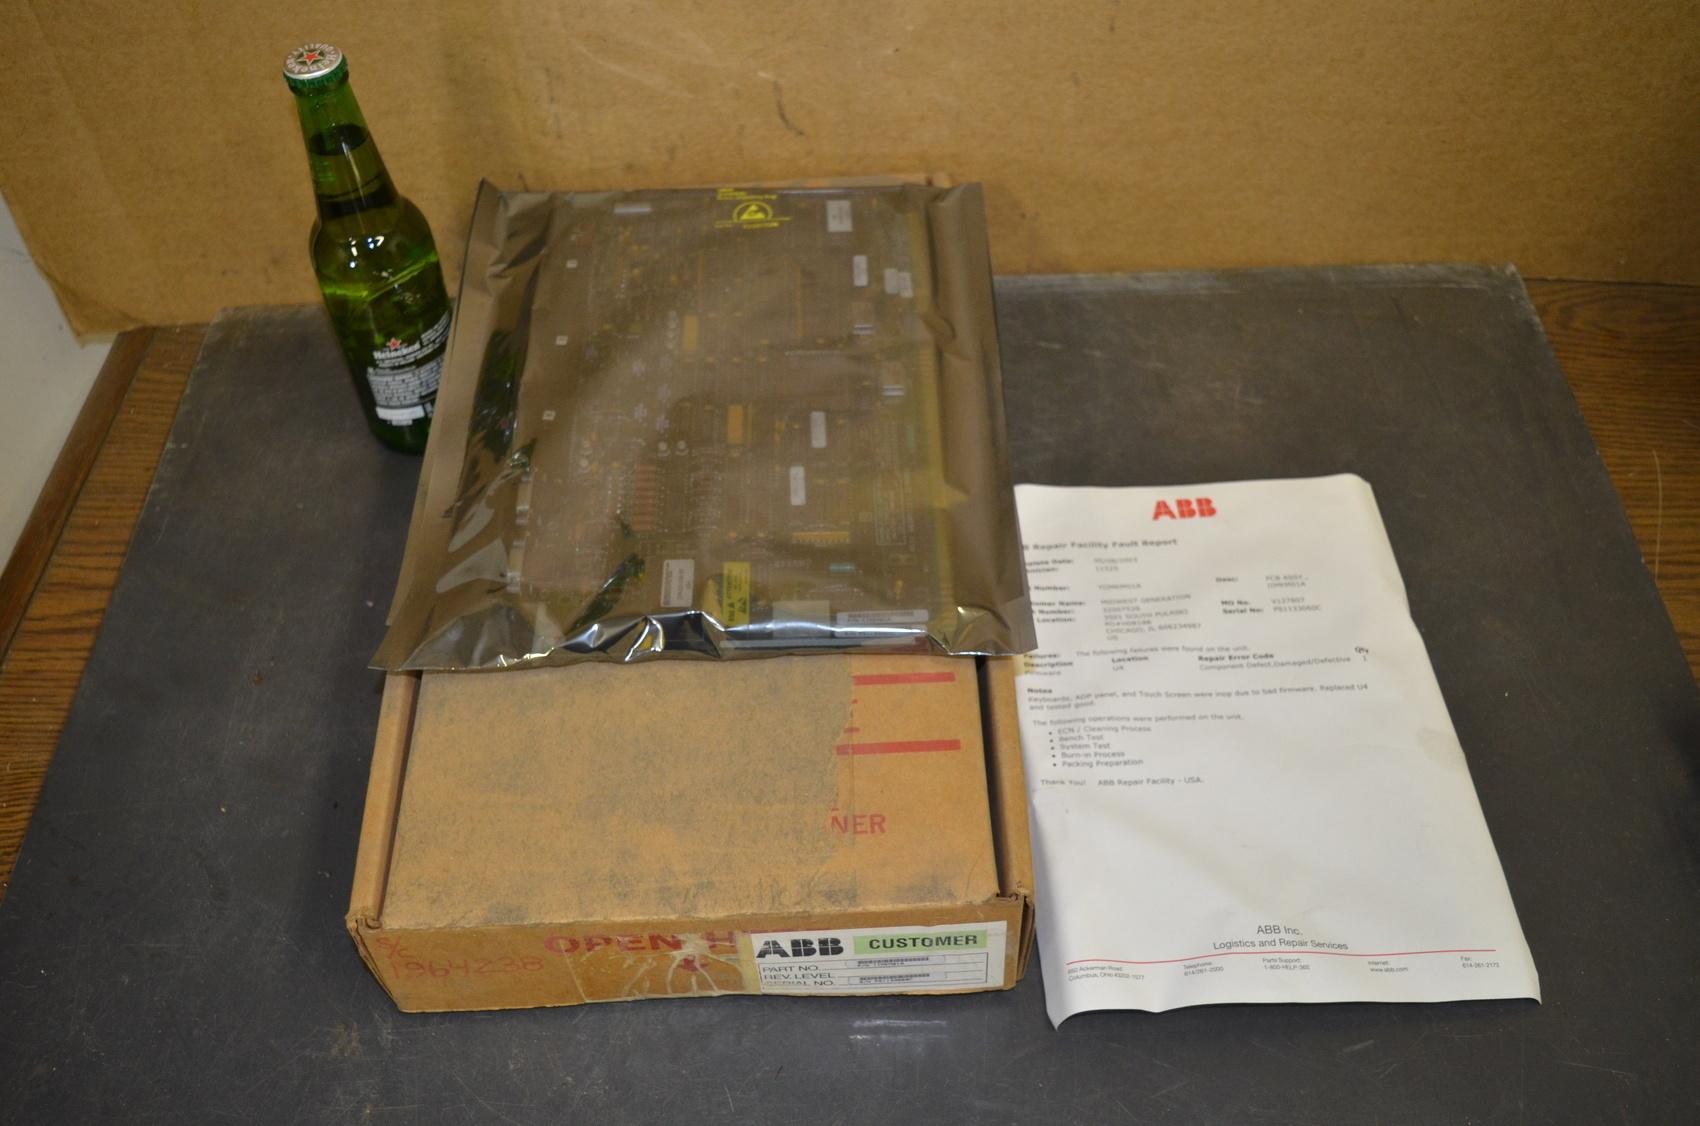 ABB IIMKM01A PC BOARD